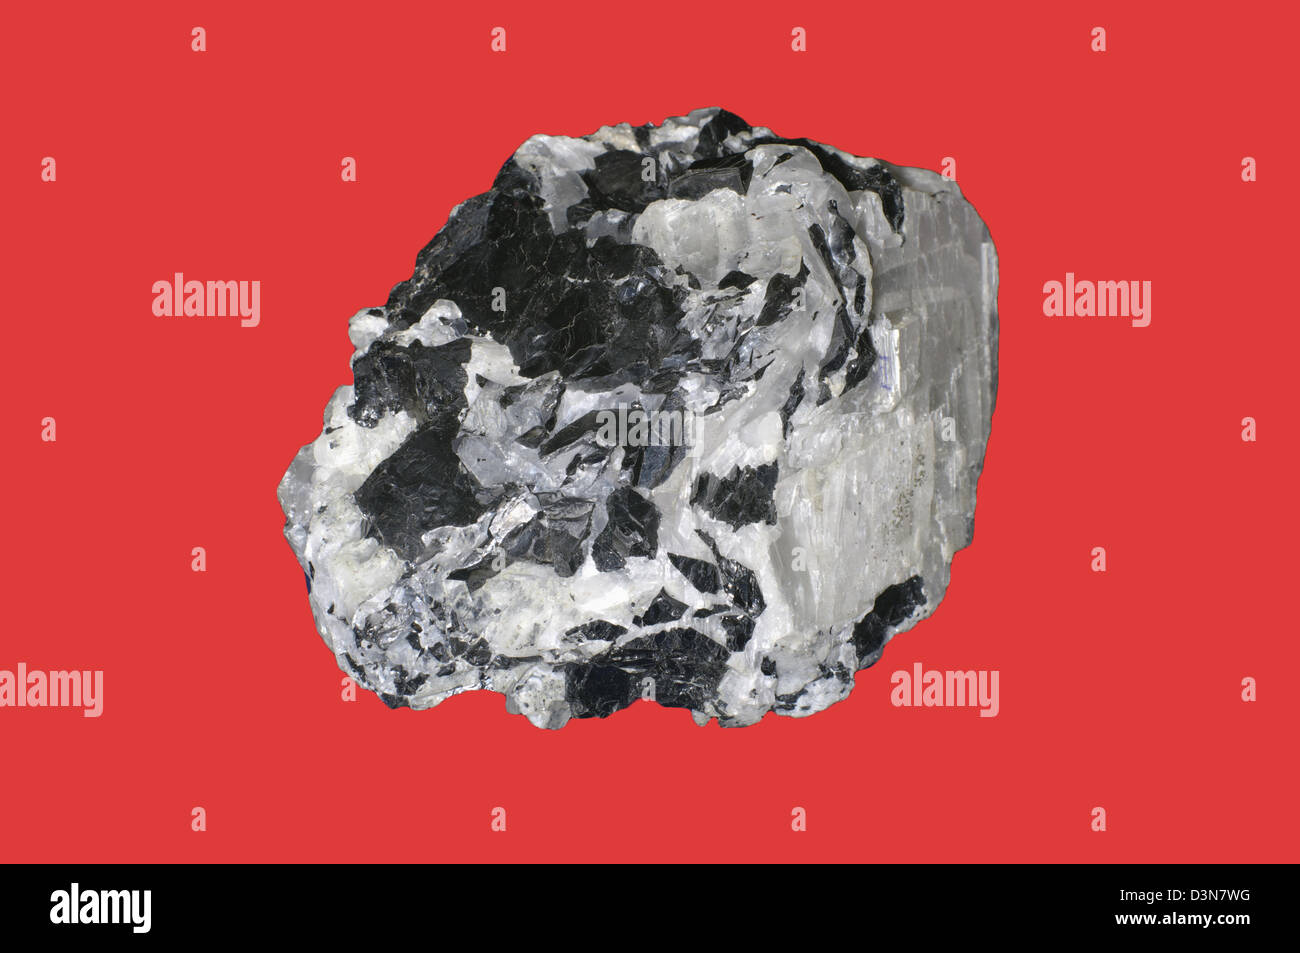 sphalerite, calcite on red - Stock Image